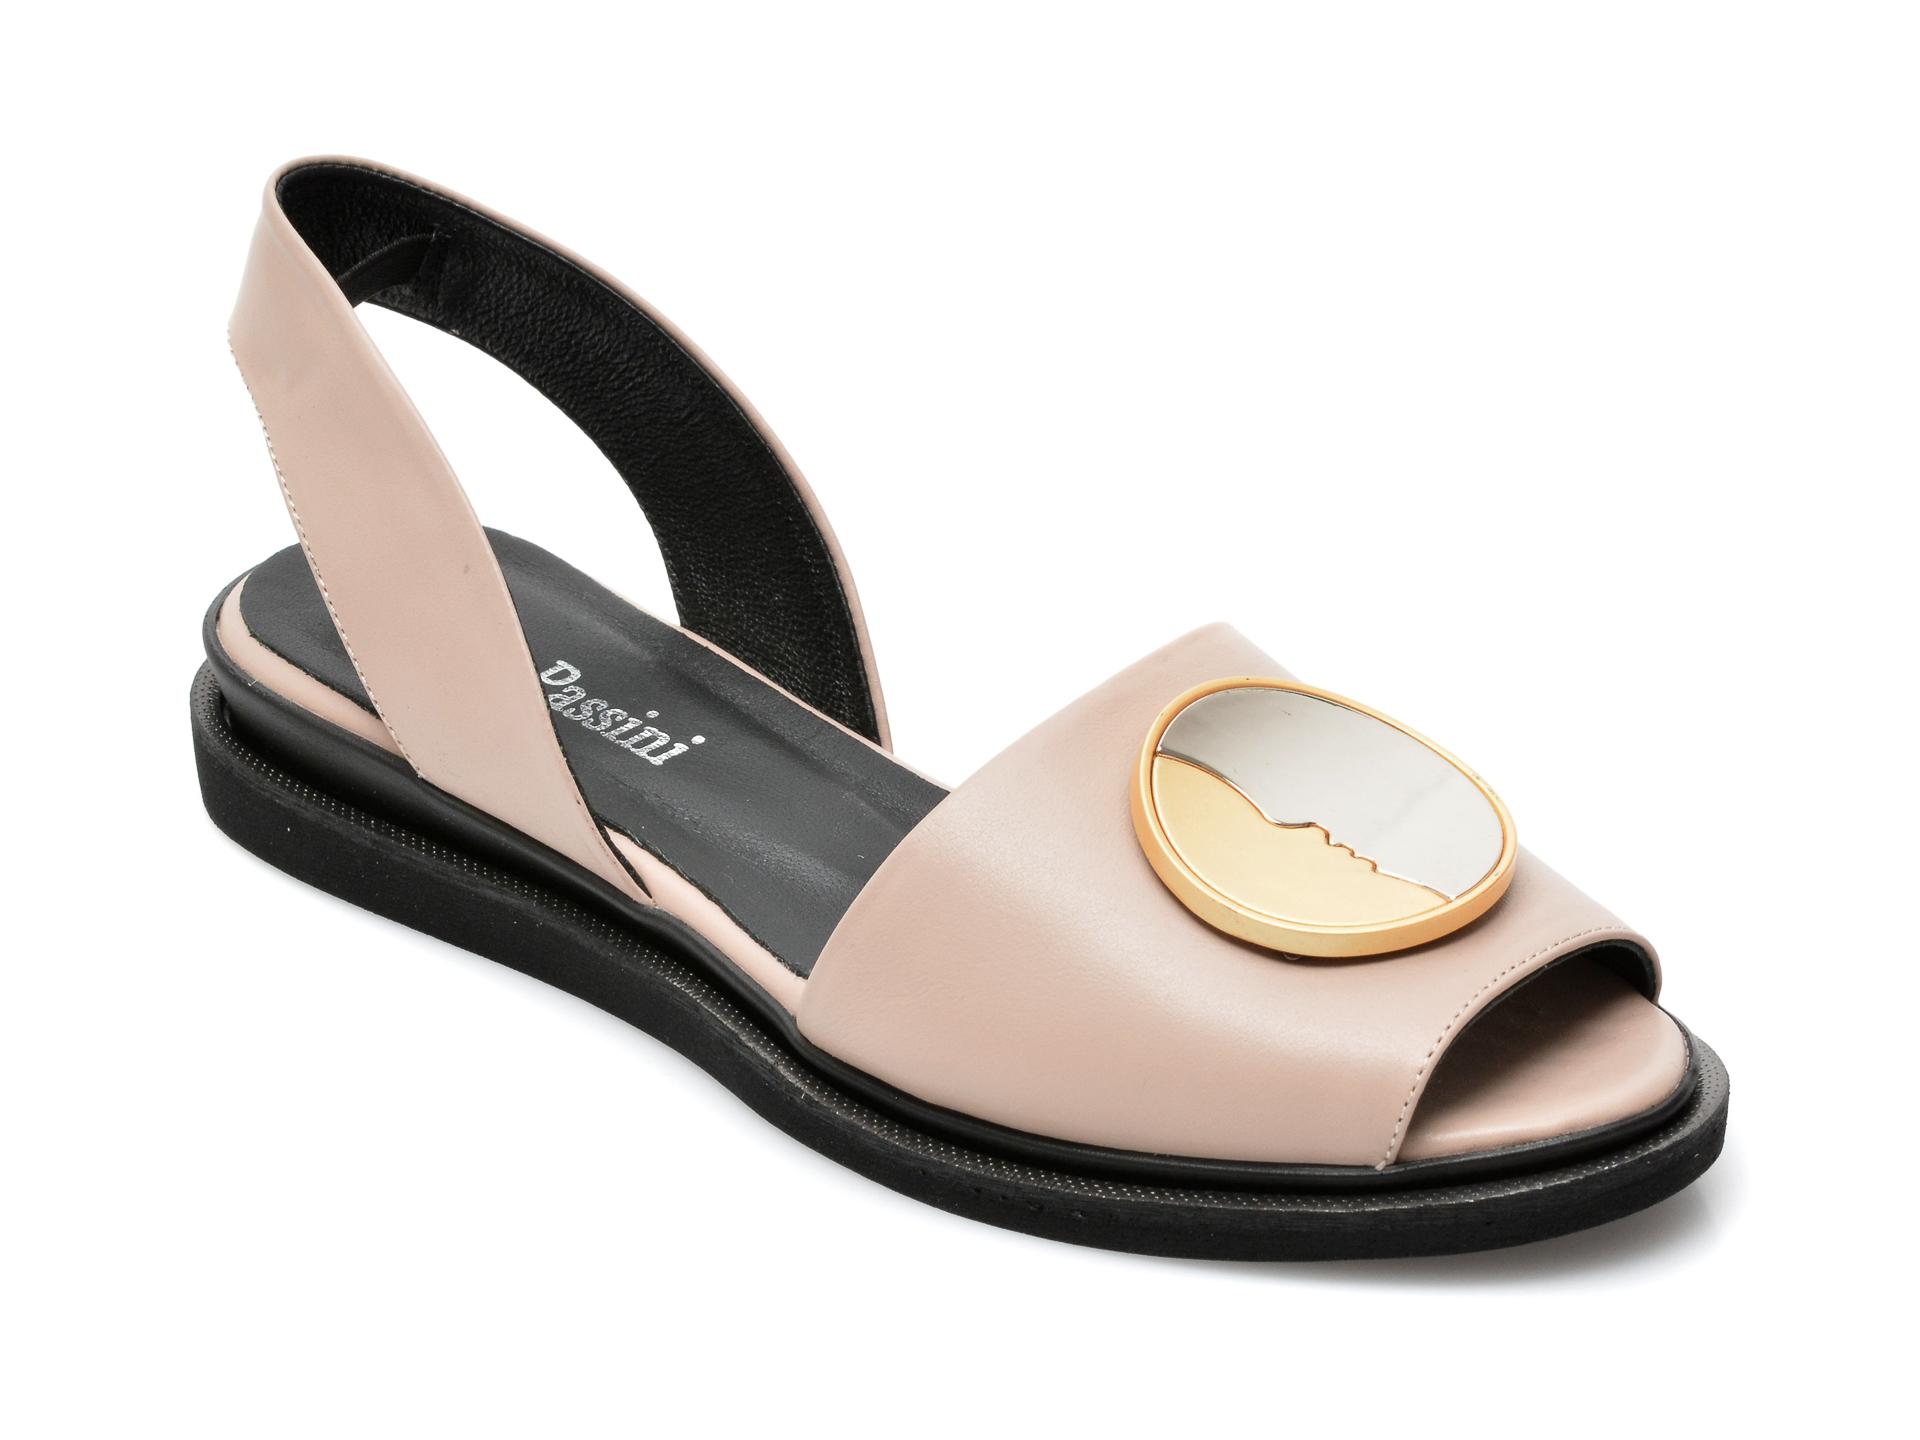 Sandale FLAVIA PASSINI nude, 1582021, din piele naturala imagine otter.ro 2021